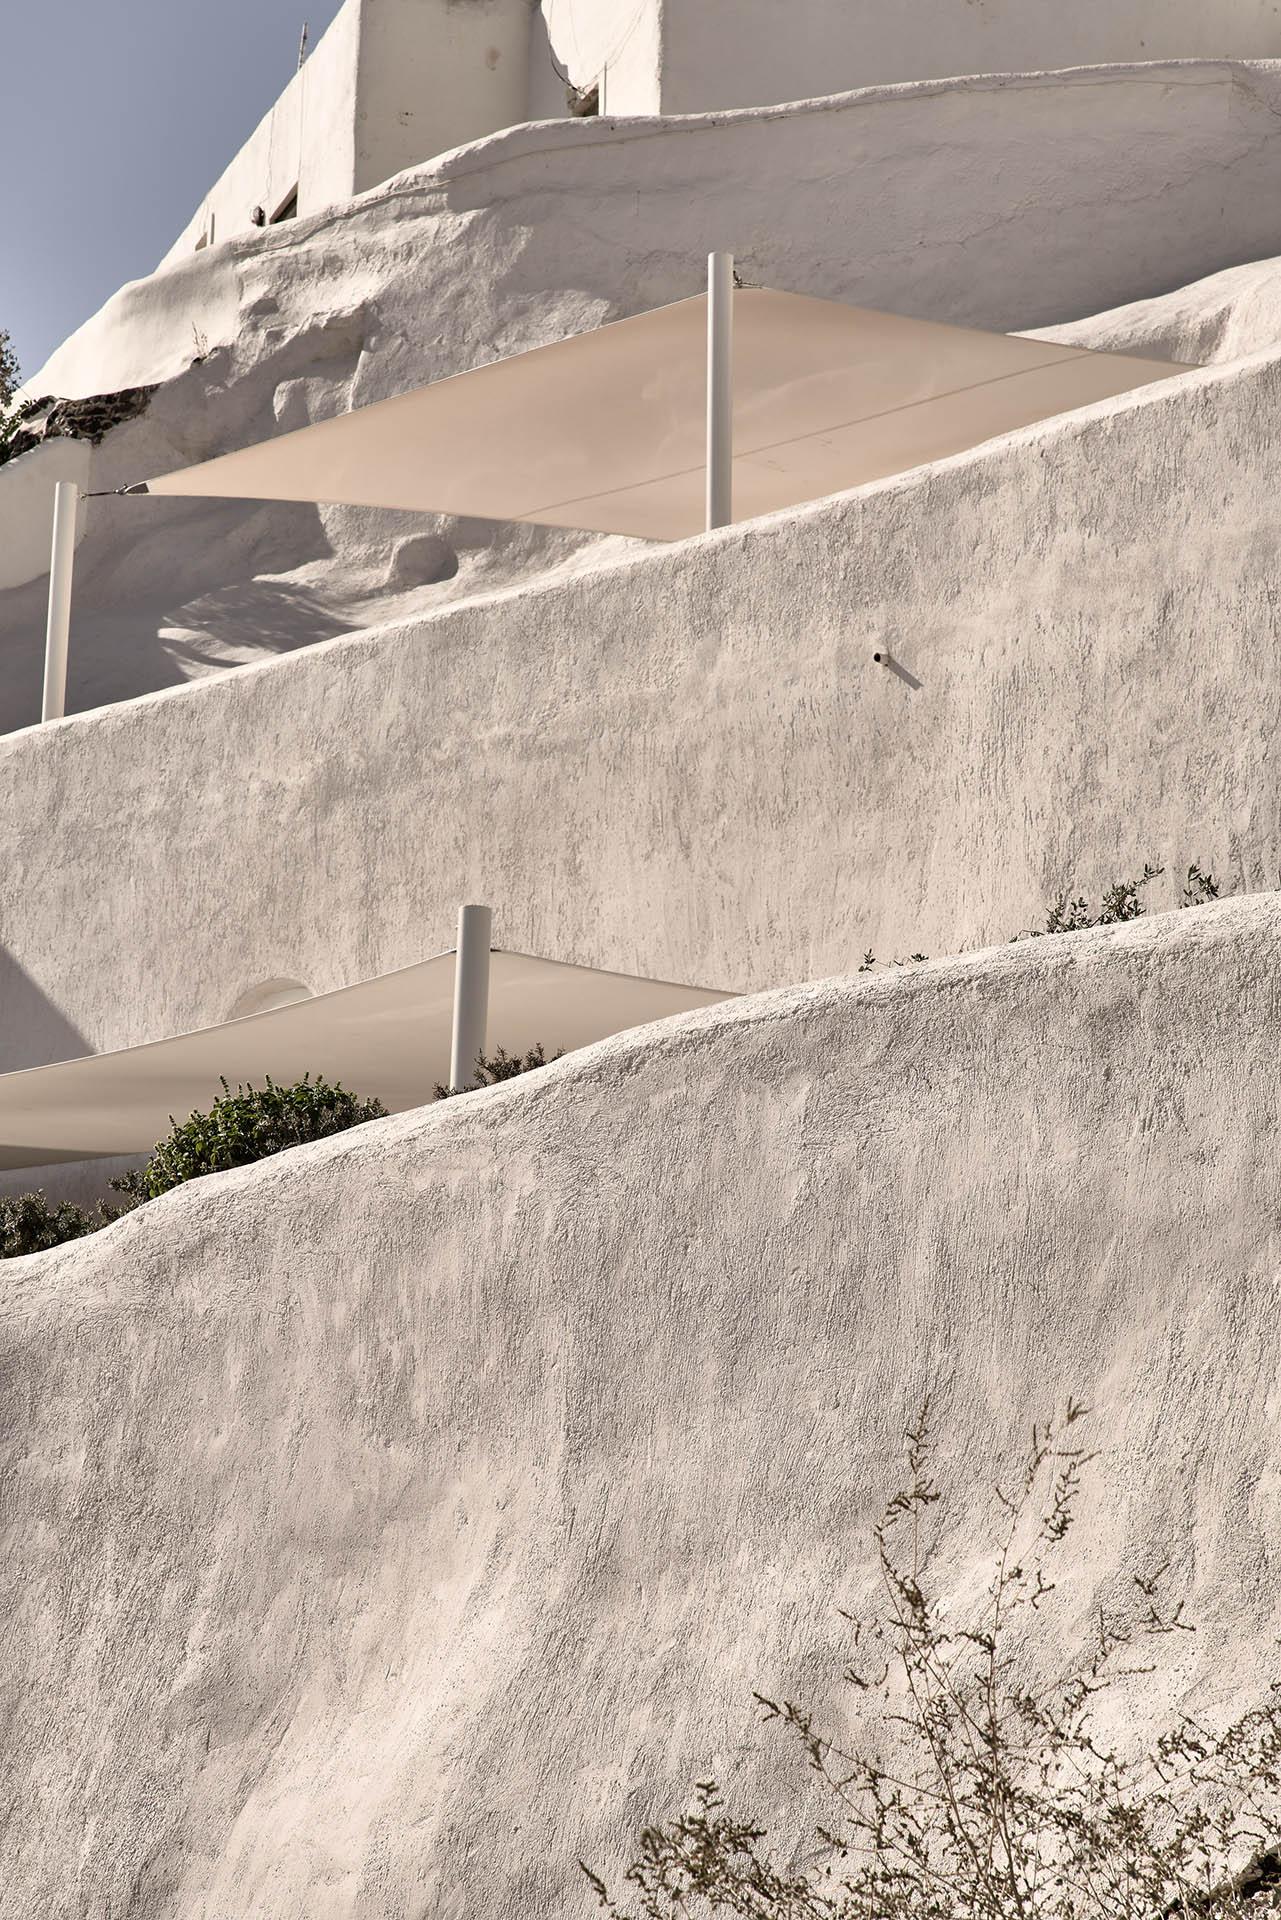 Mystique's villas and suites are built into the rocks